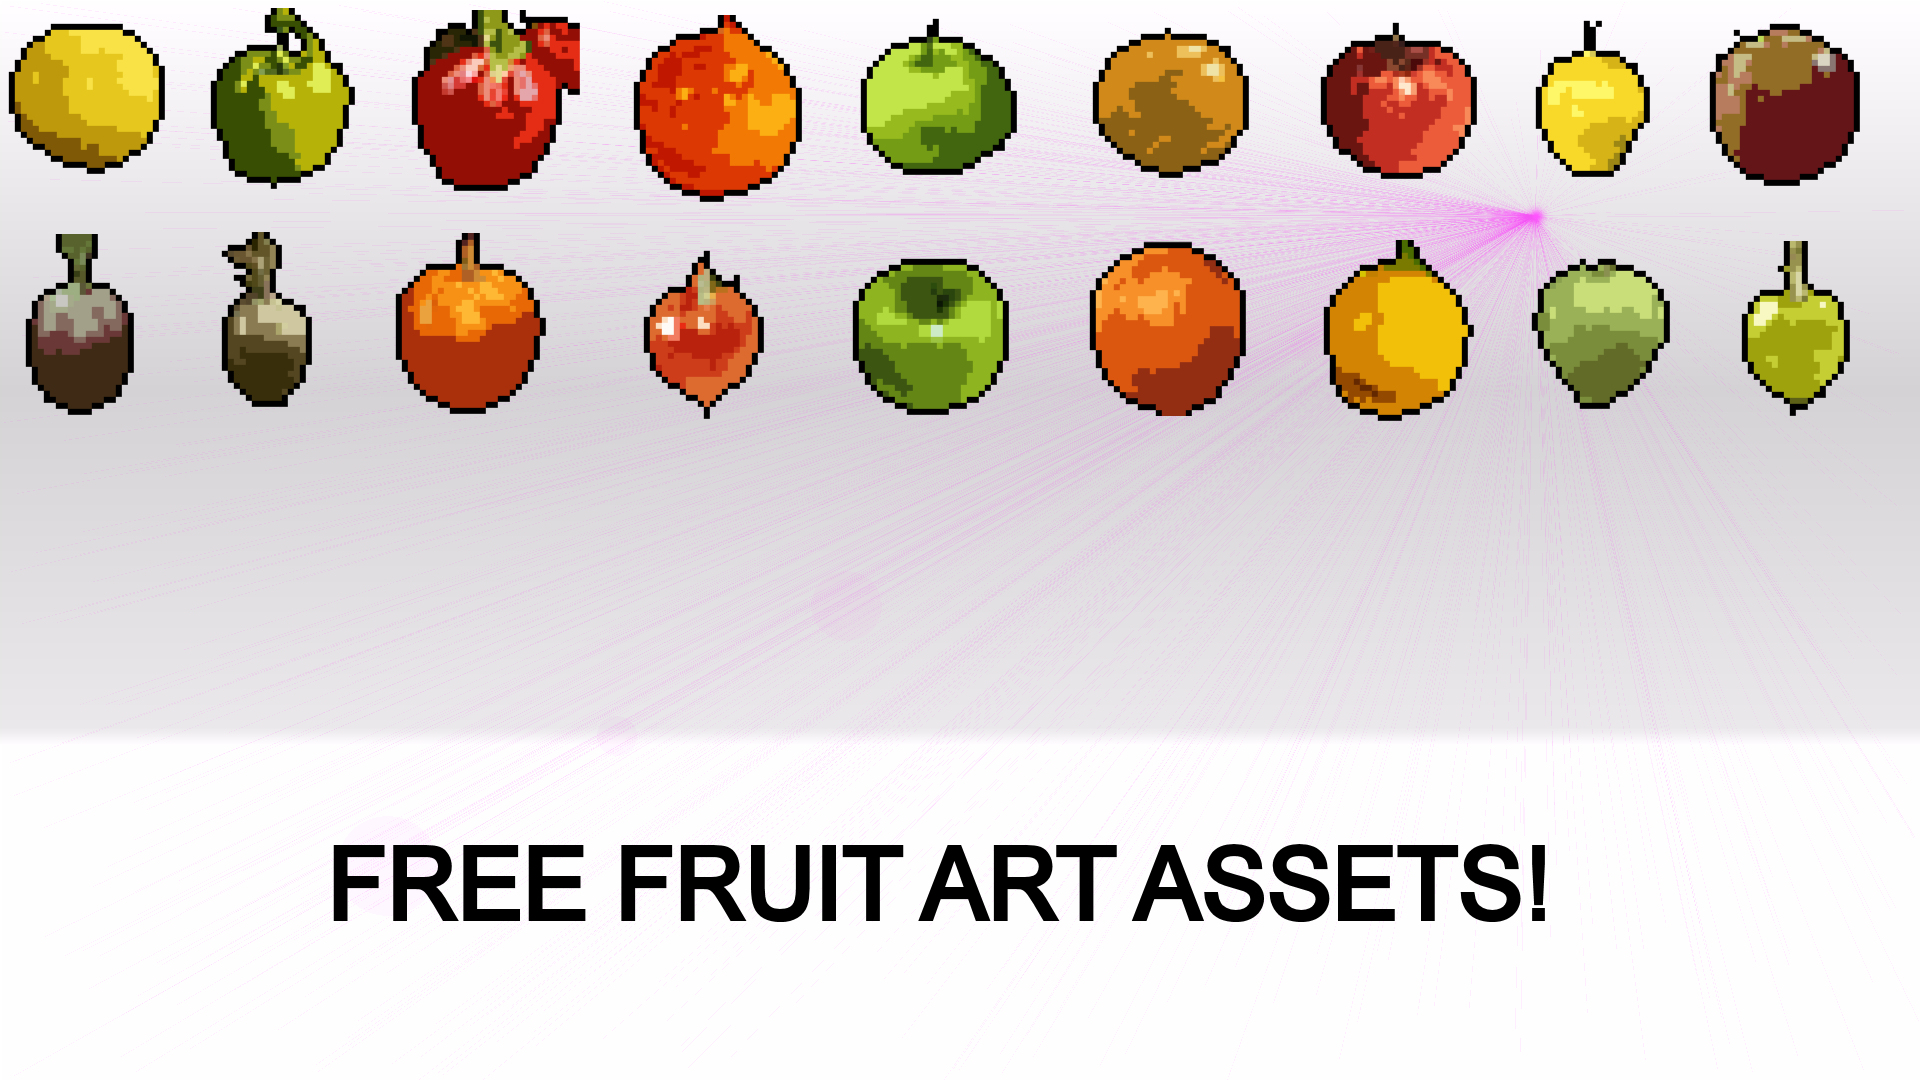 Free Pixel Art Fruit Assets